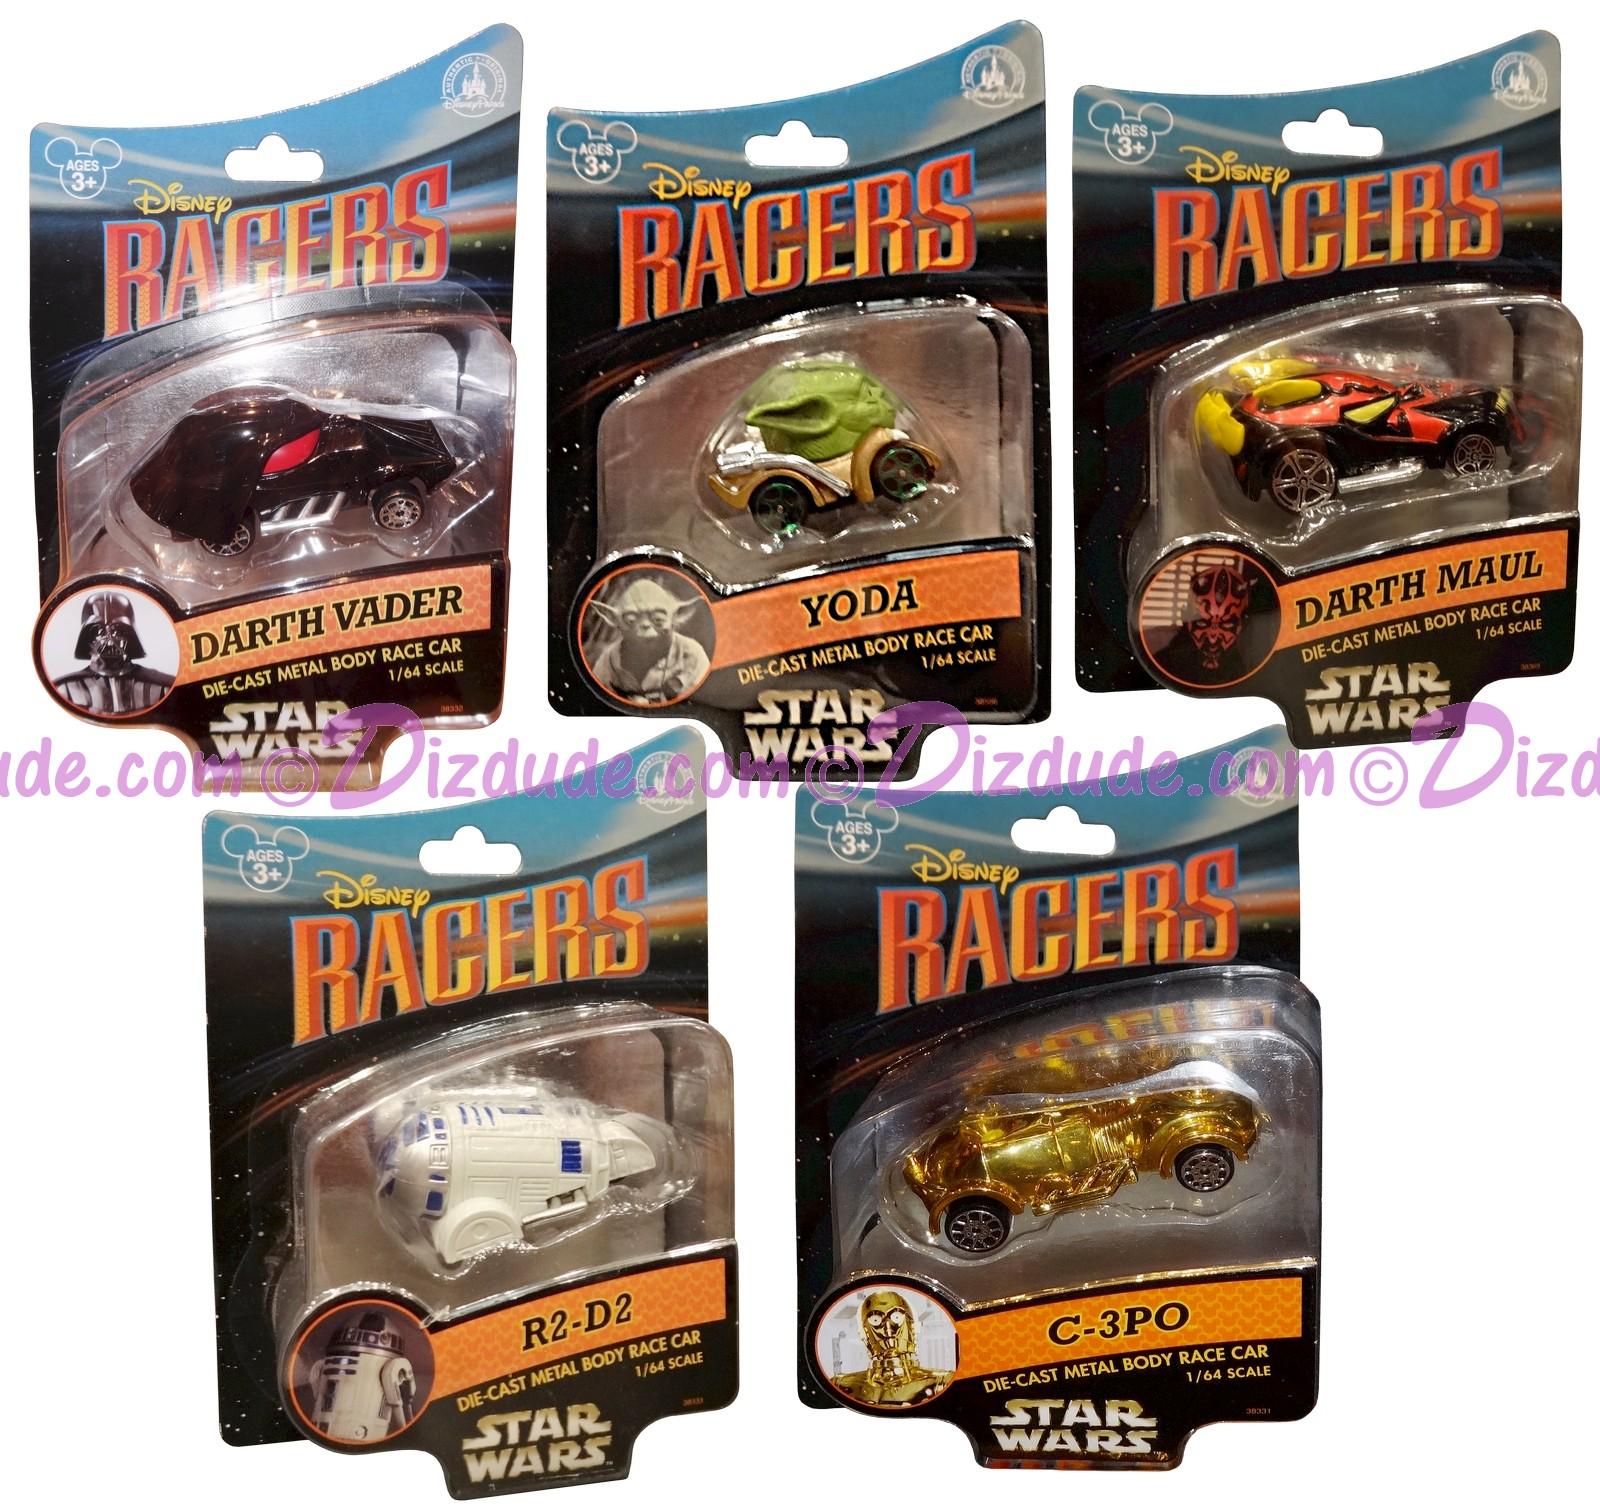 Star Tours Disney Racers Set with Darth Vader • Darth Maul • Yoda • C-3PO and R2-D2 - Disney Star Wars Weekends 2014 © Dizdude.com